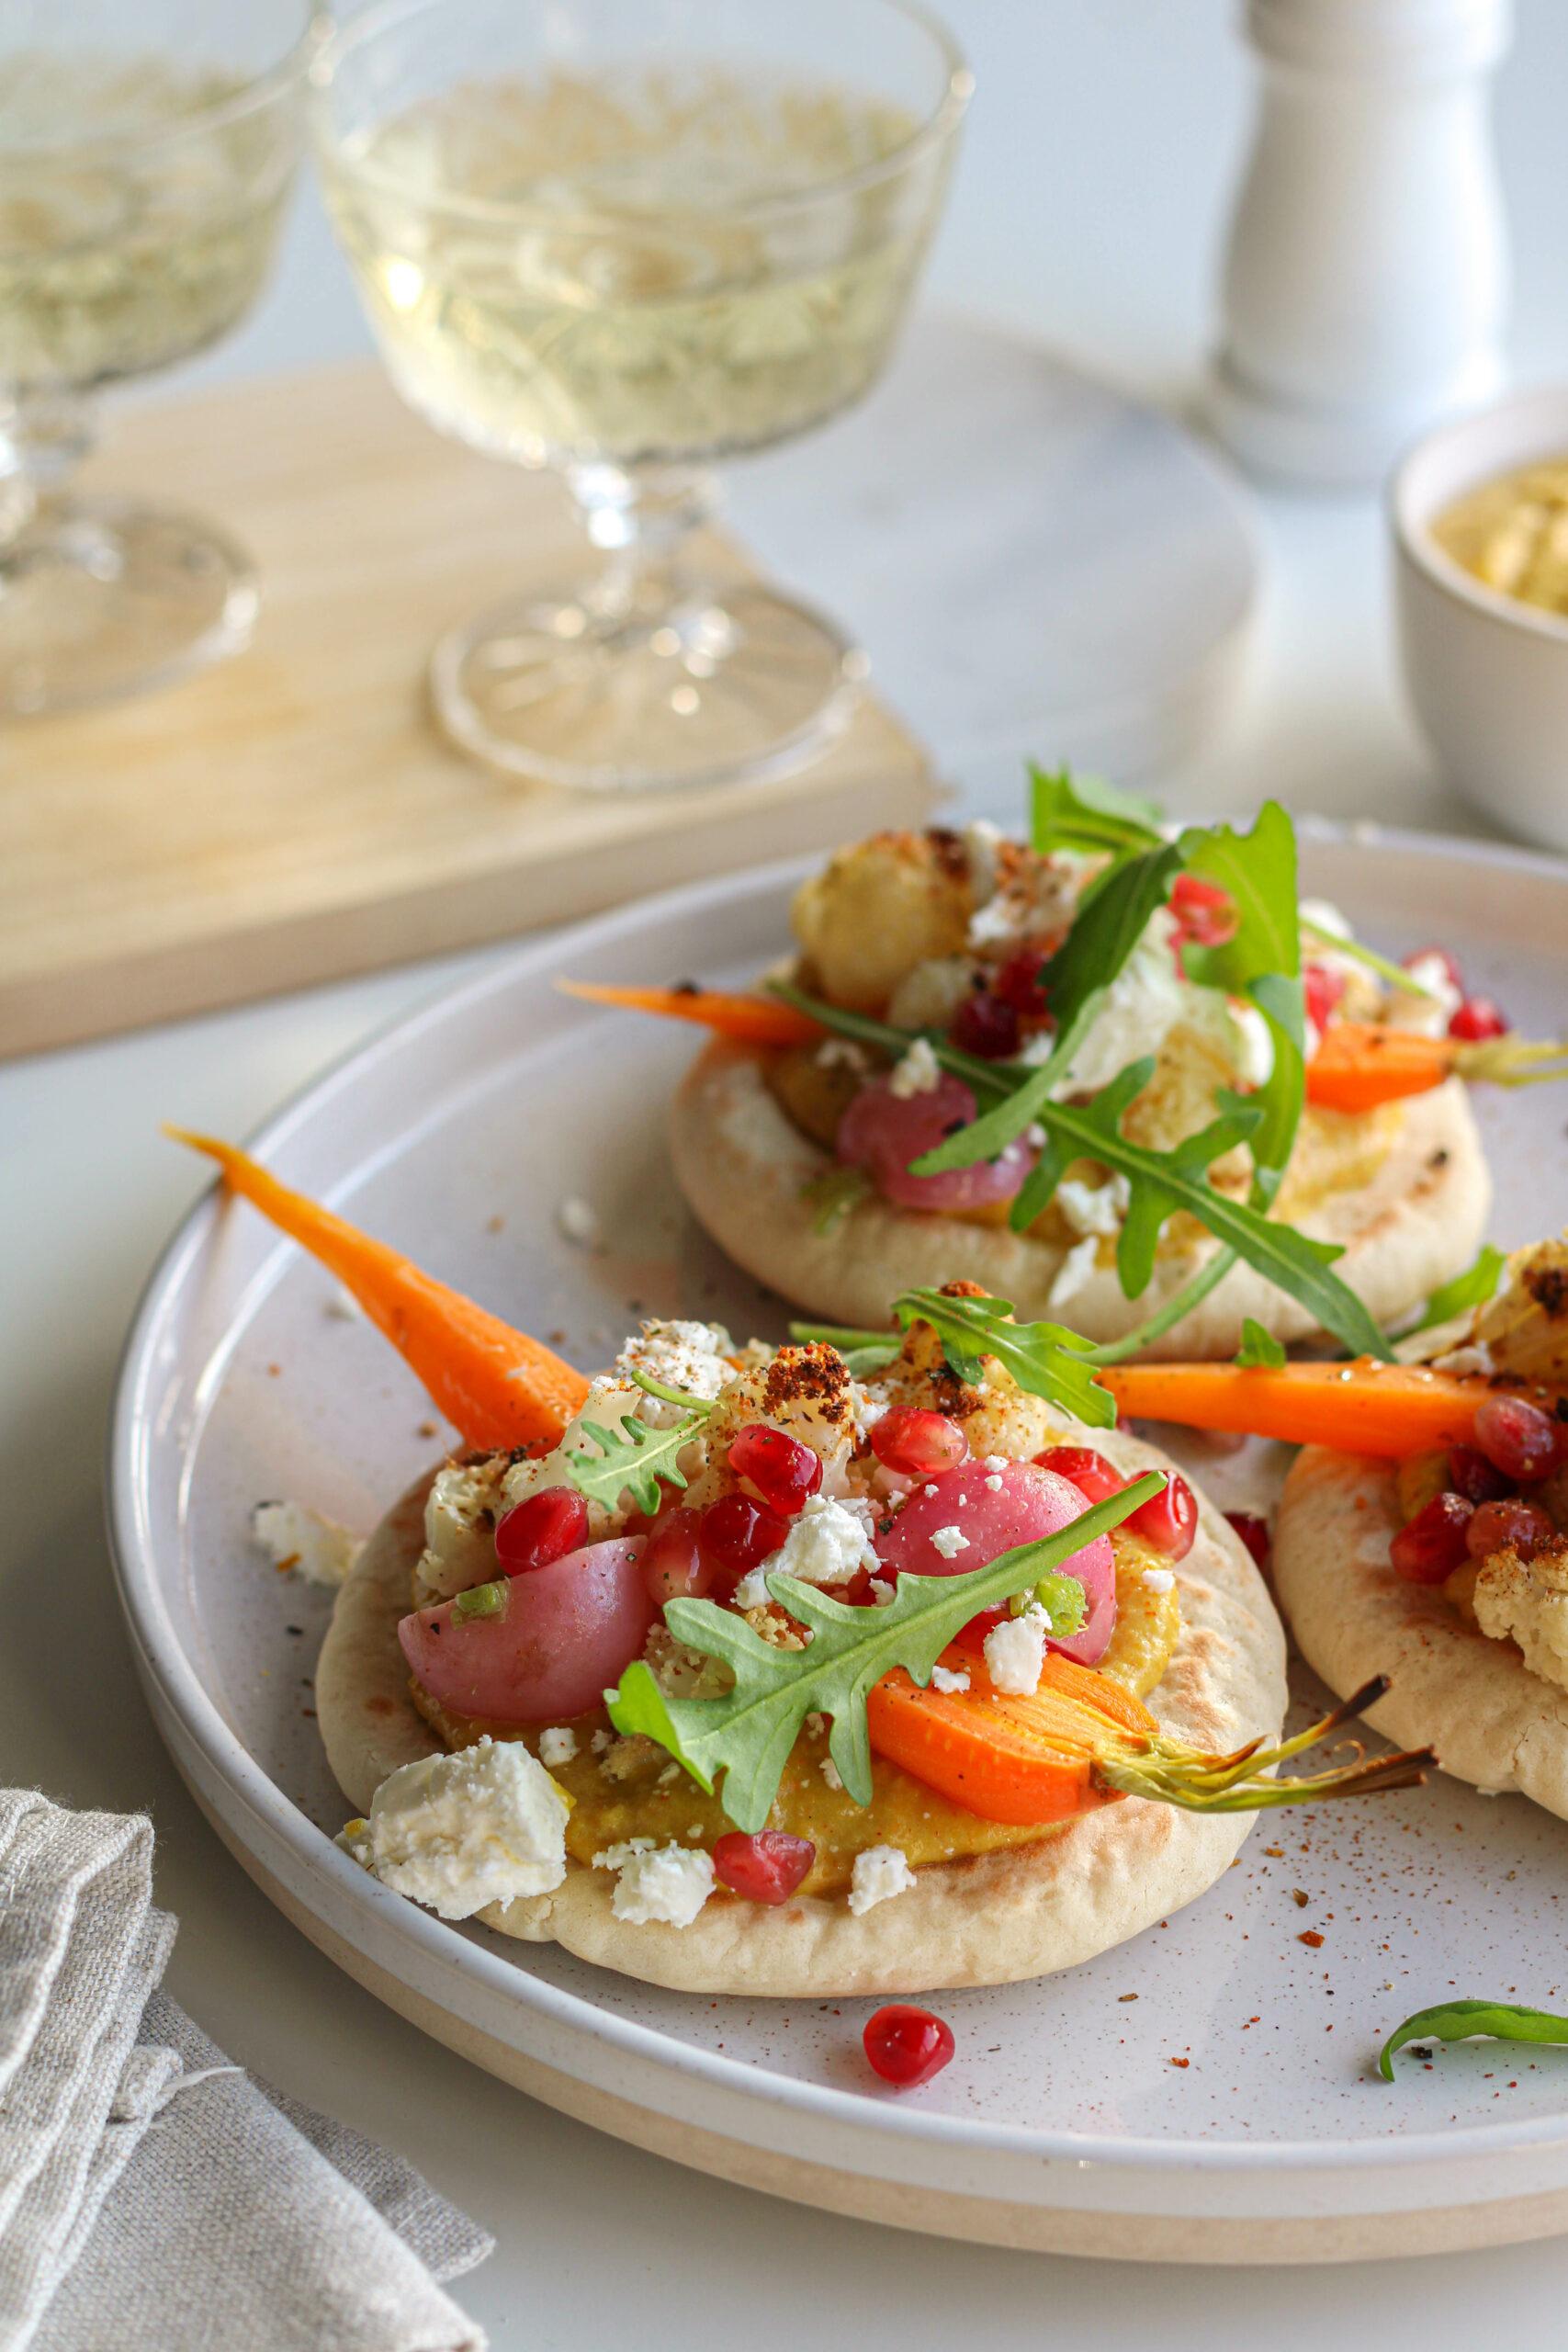 Pitatoast met hummus, geroosterde groenten en feta